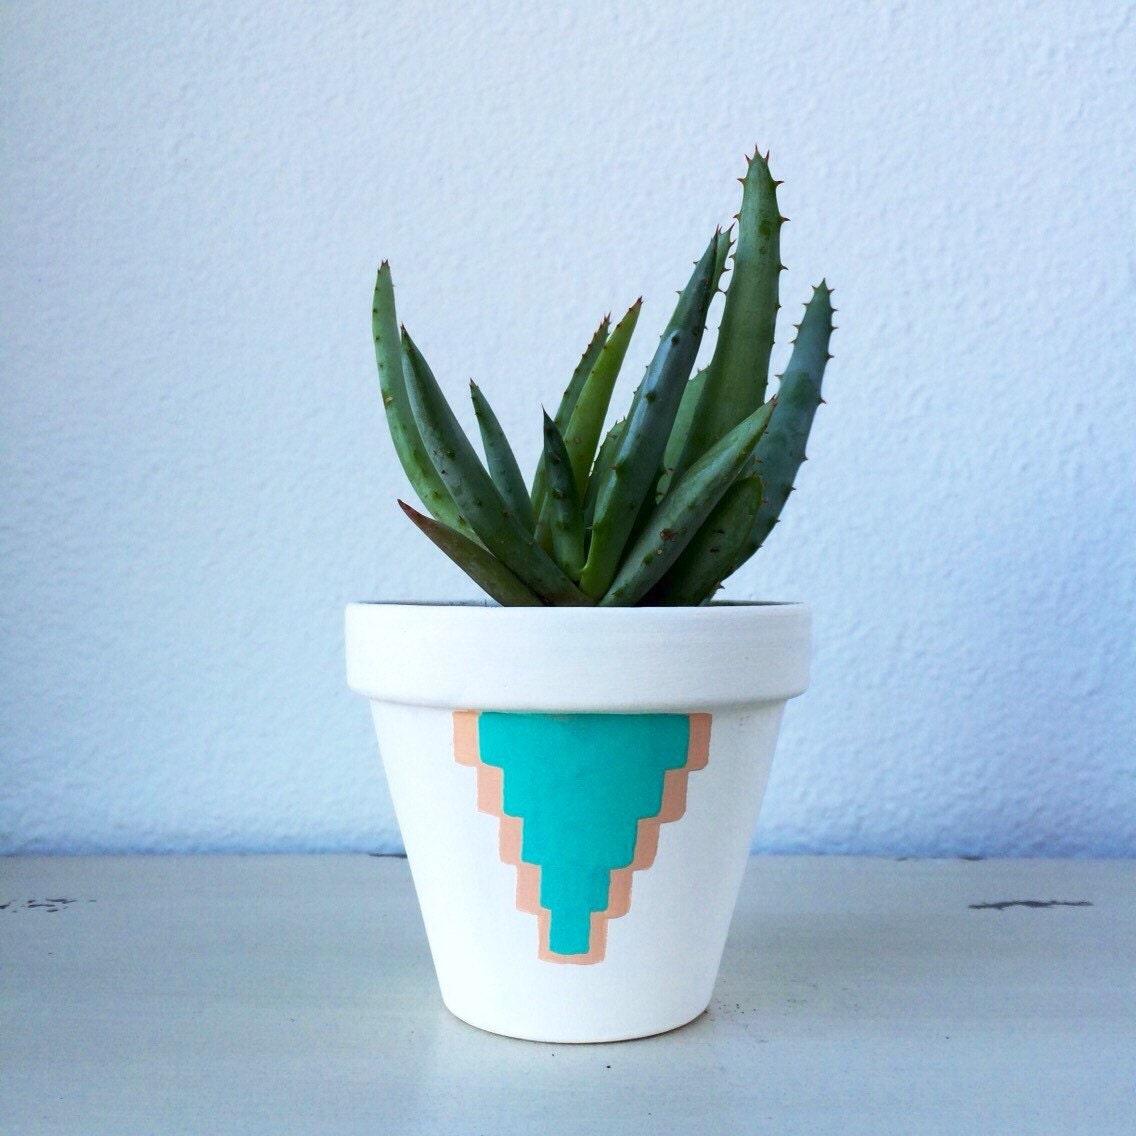 Pot A Cactus : 4 terra cotta cactus pot hand painted aquamarine ~ Premium-room.com Idées de Décoration